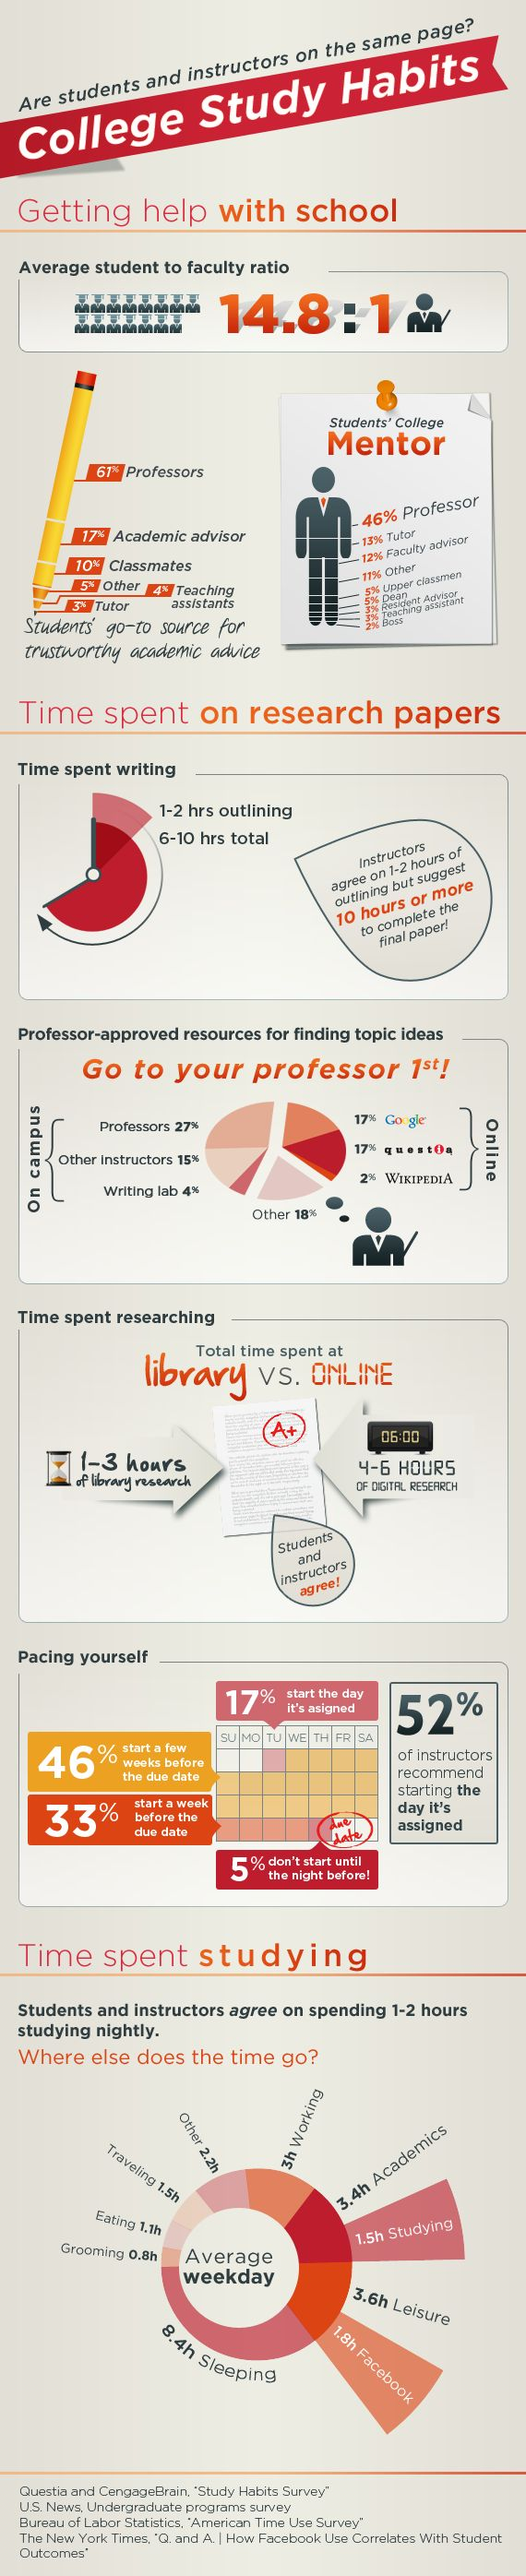 College Study Habits [INFOGRAPHIC] #college #study #habits